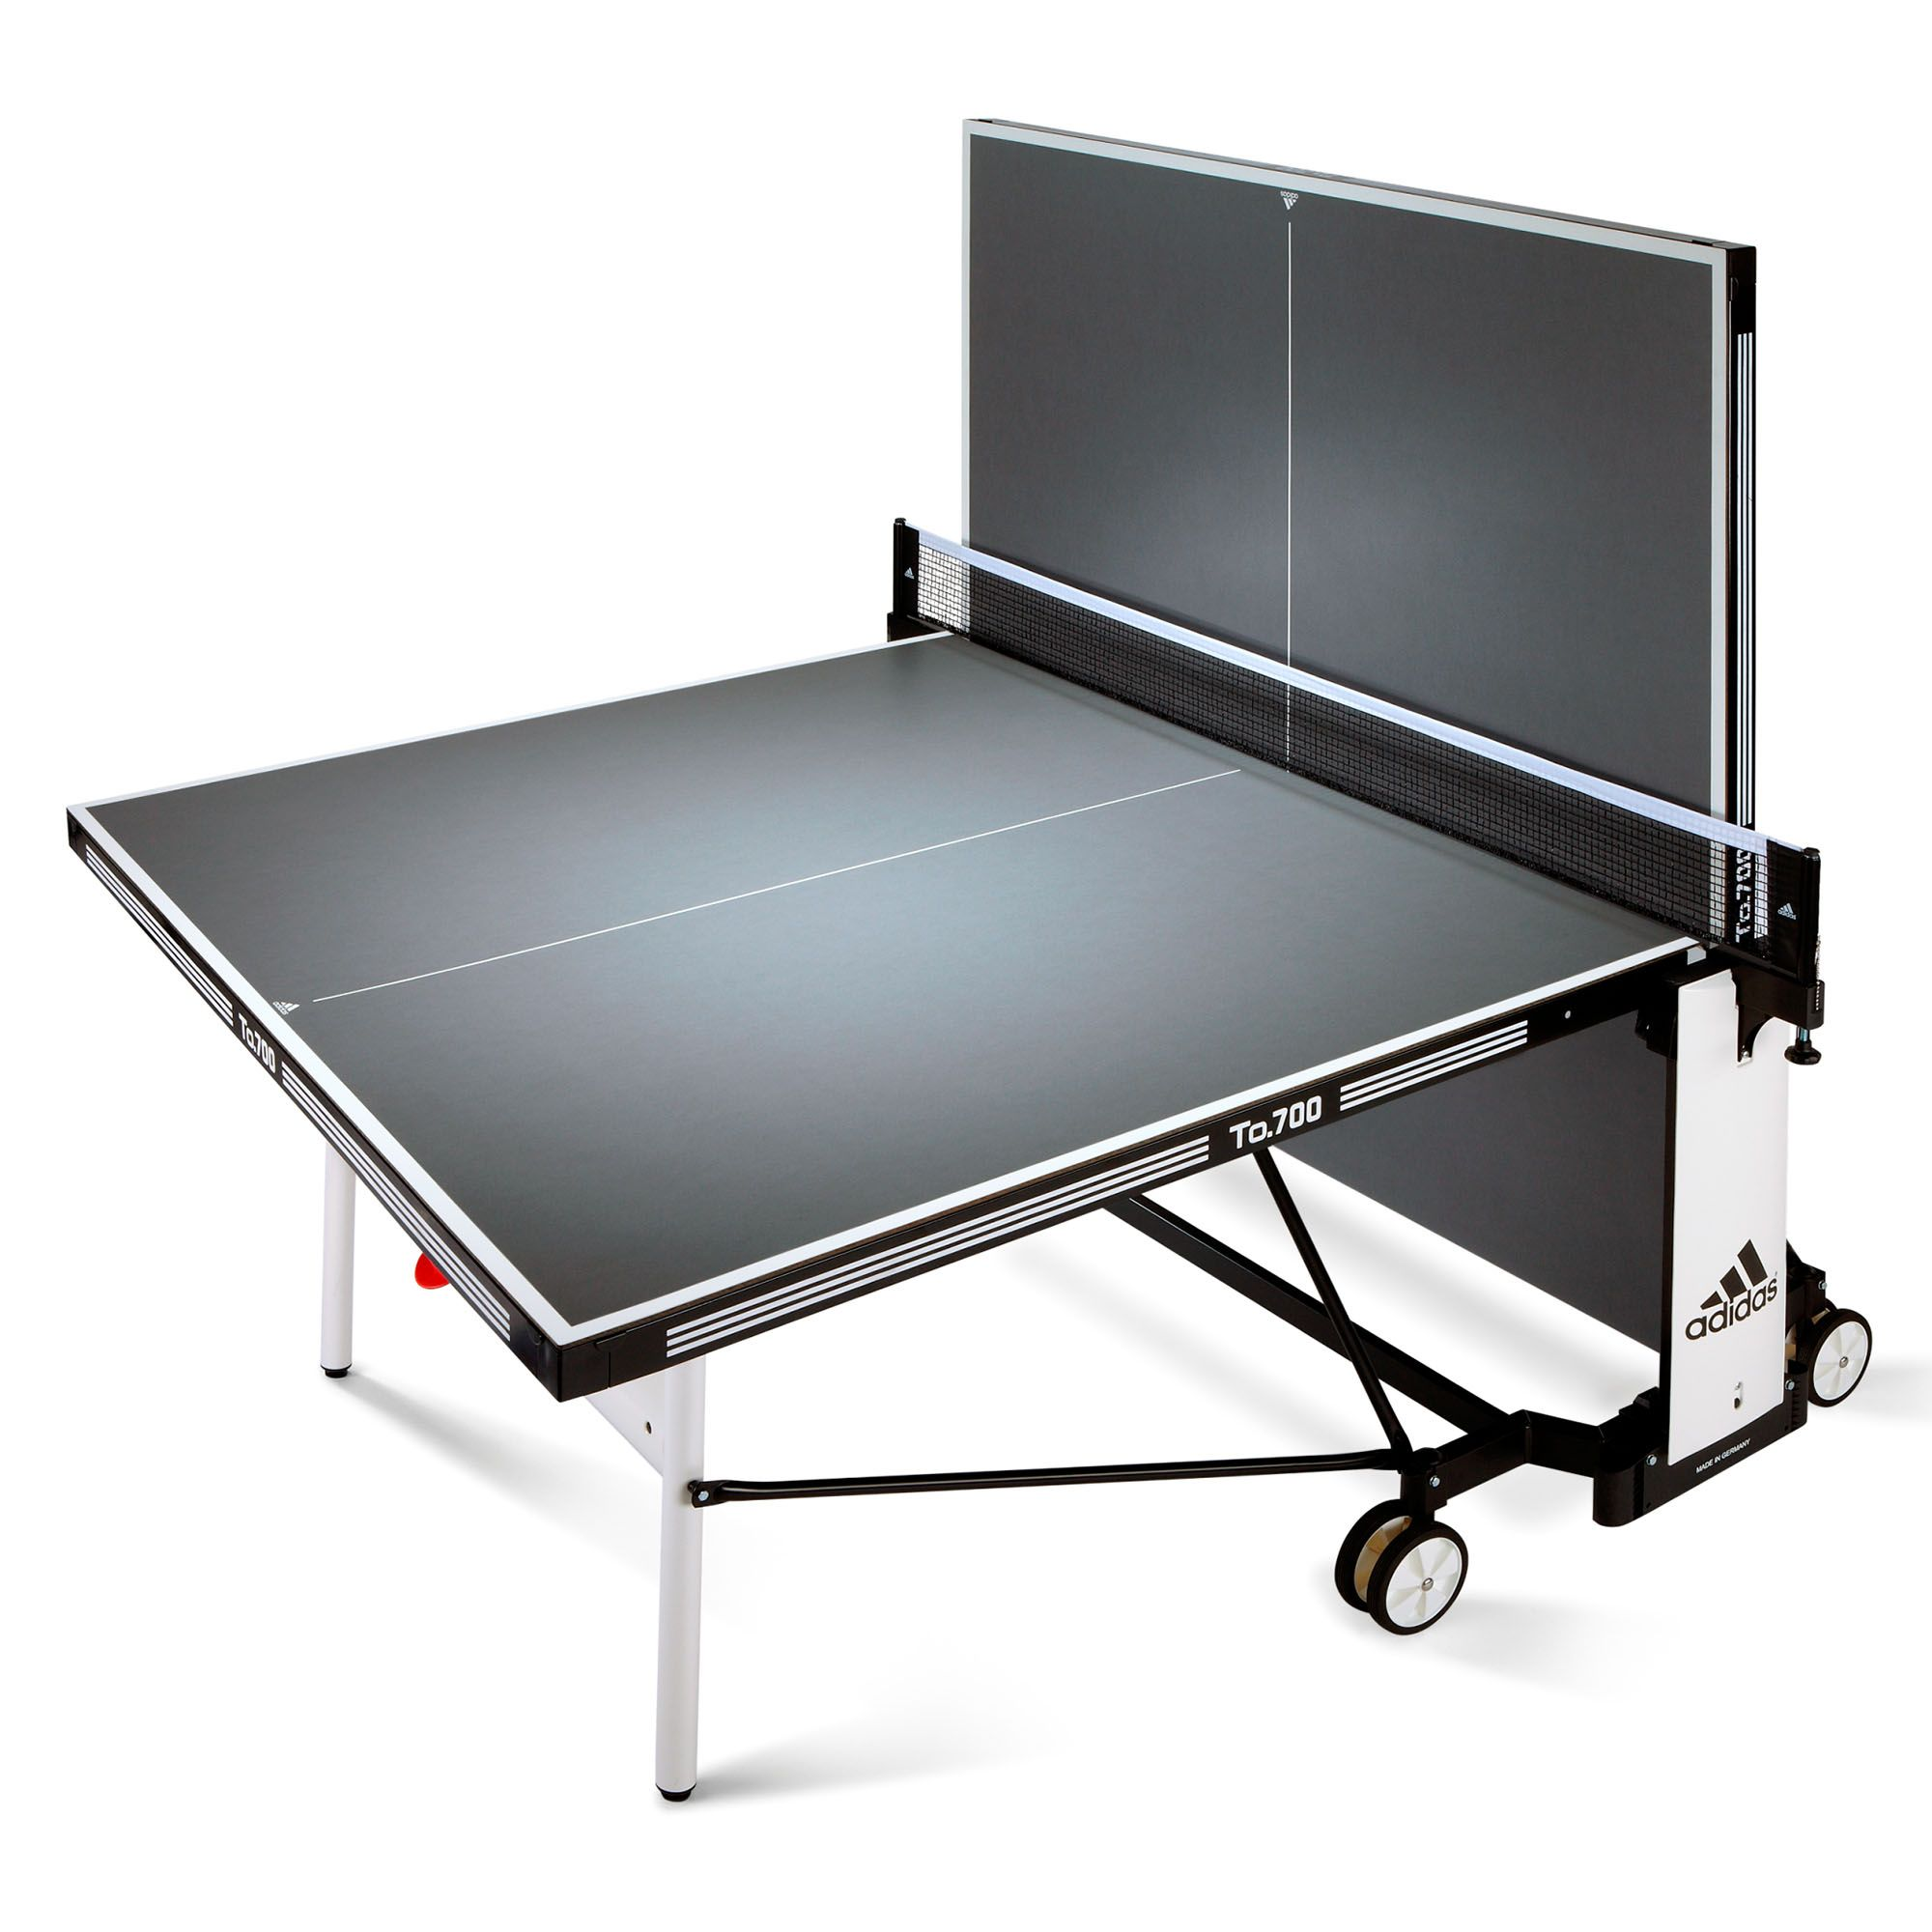 Adidas outdoor table tennis table - Weatherproof table tennis table ...